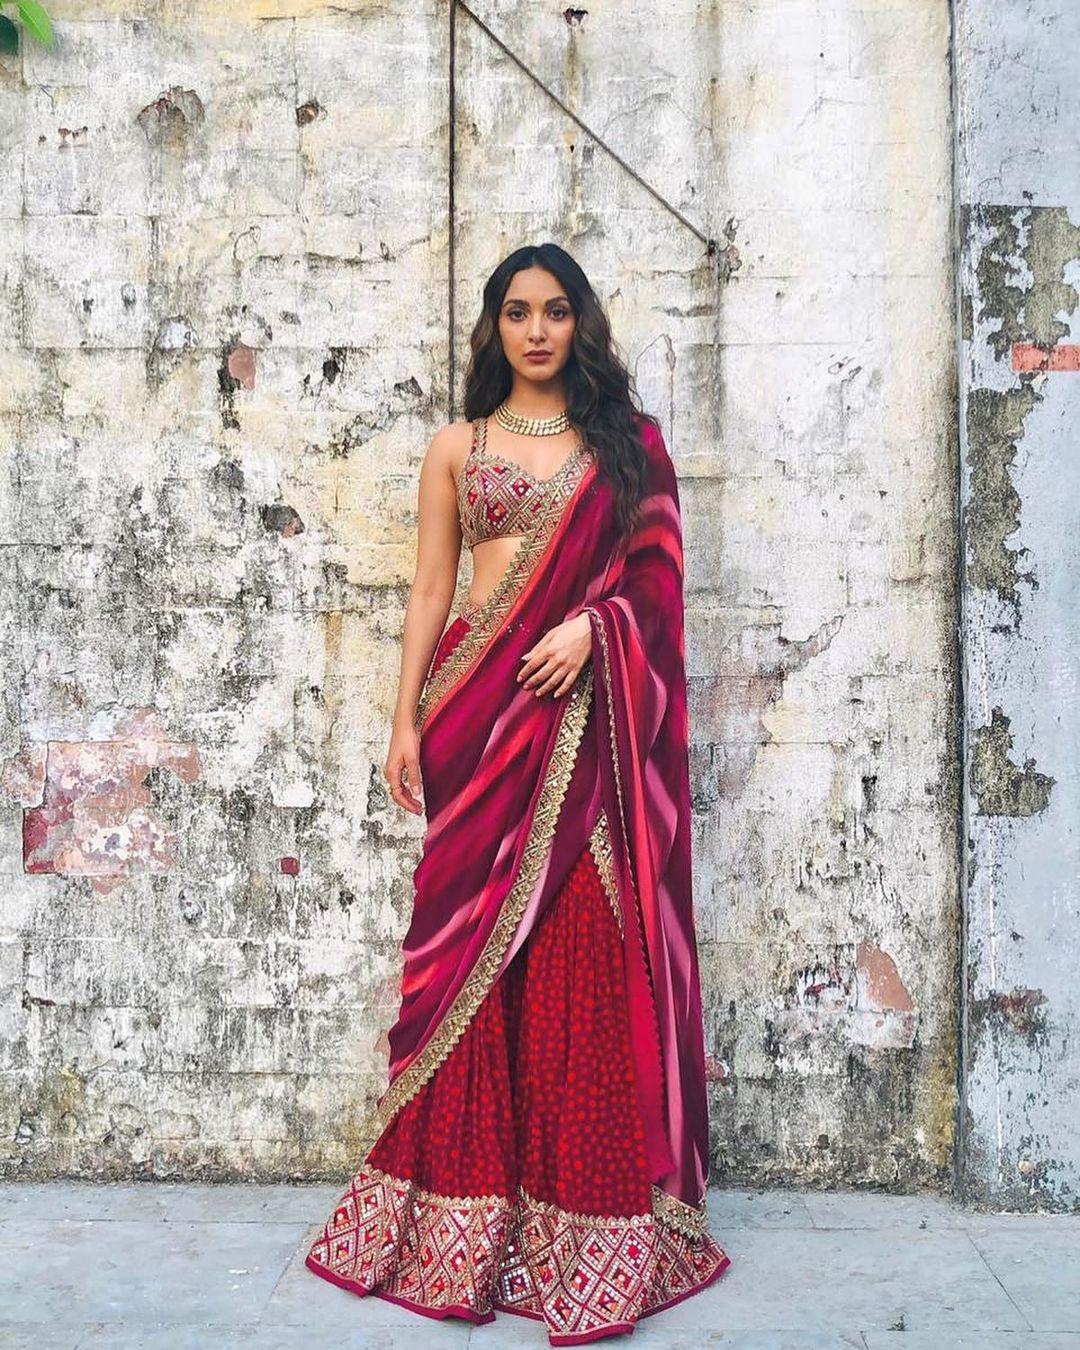 Kiara Advani Saree Images